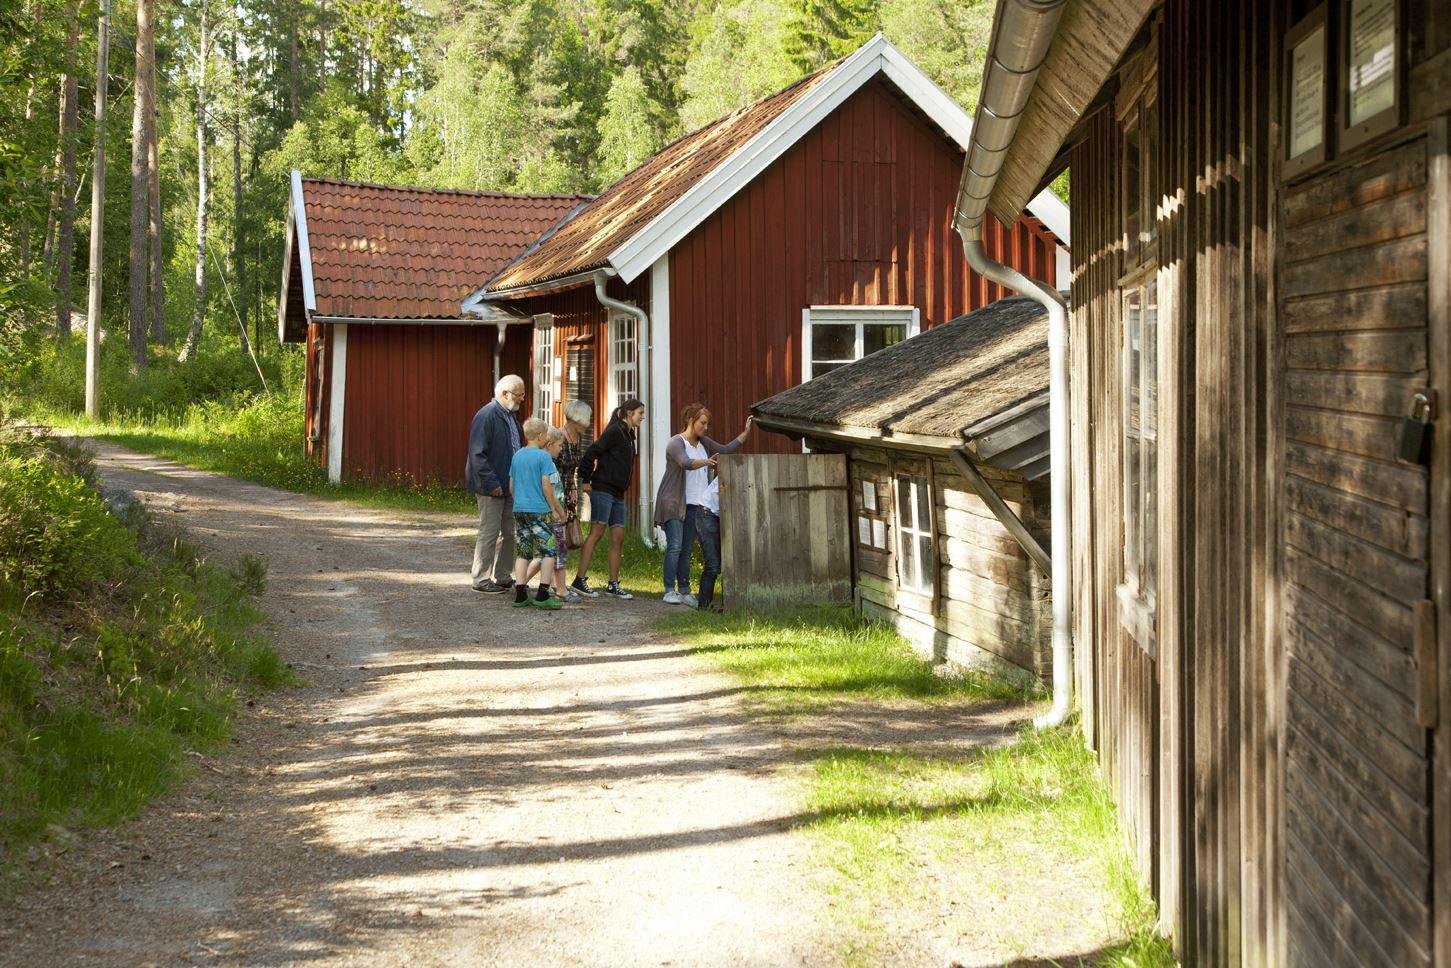 Töllstorps Industrimuseum